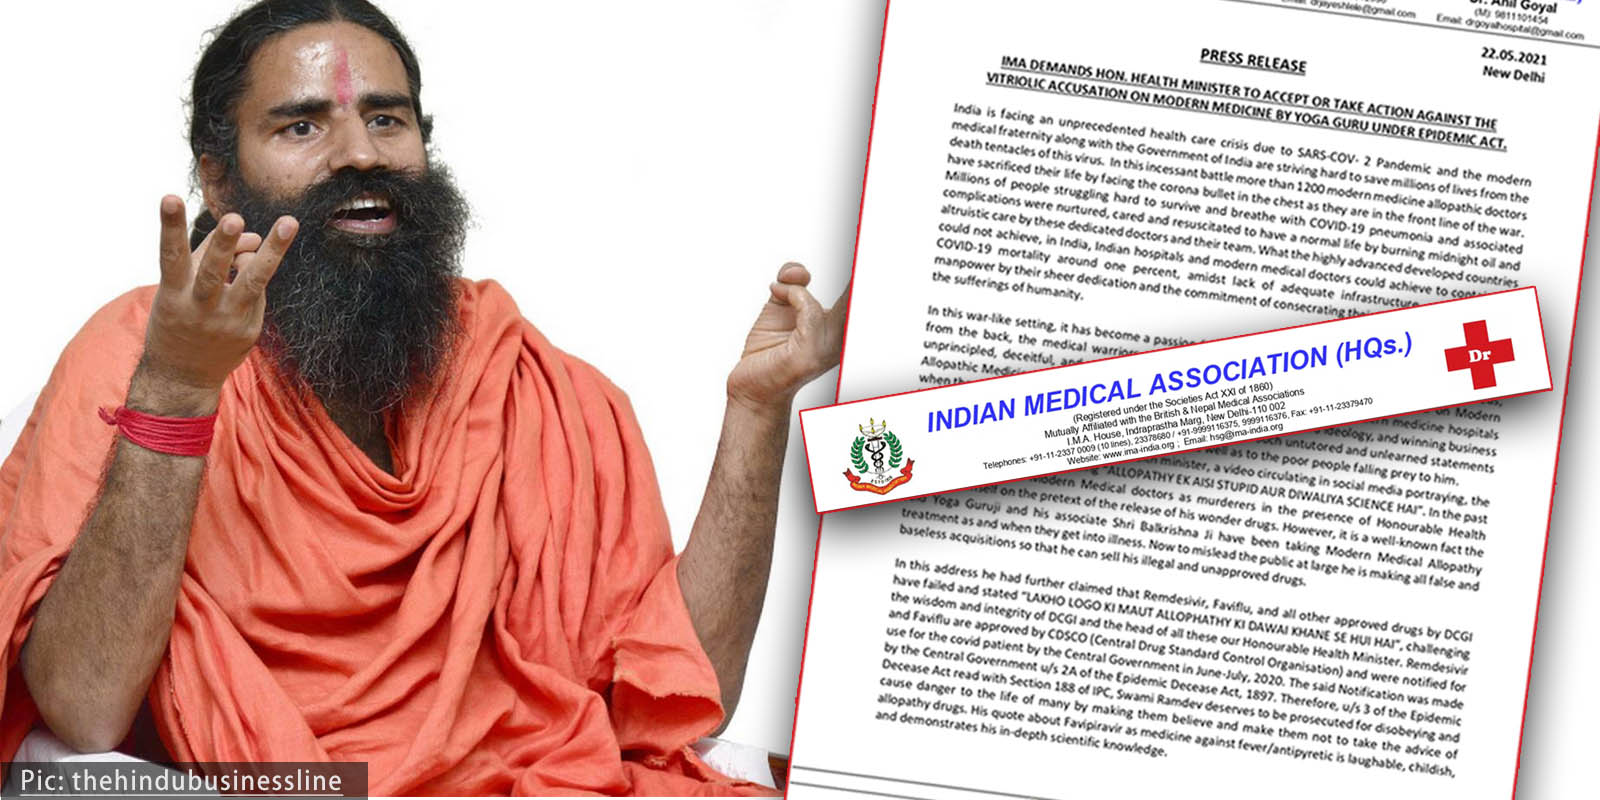 IMA statement on Baba ramdev